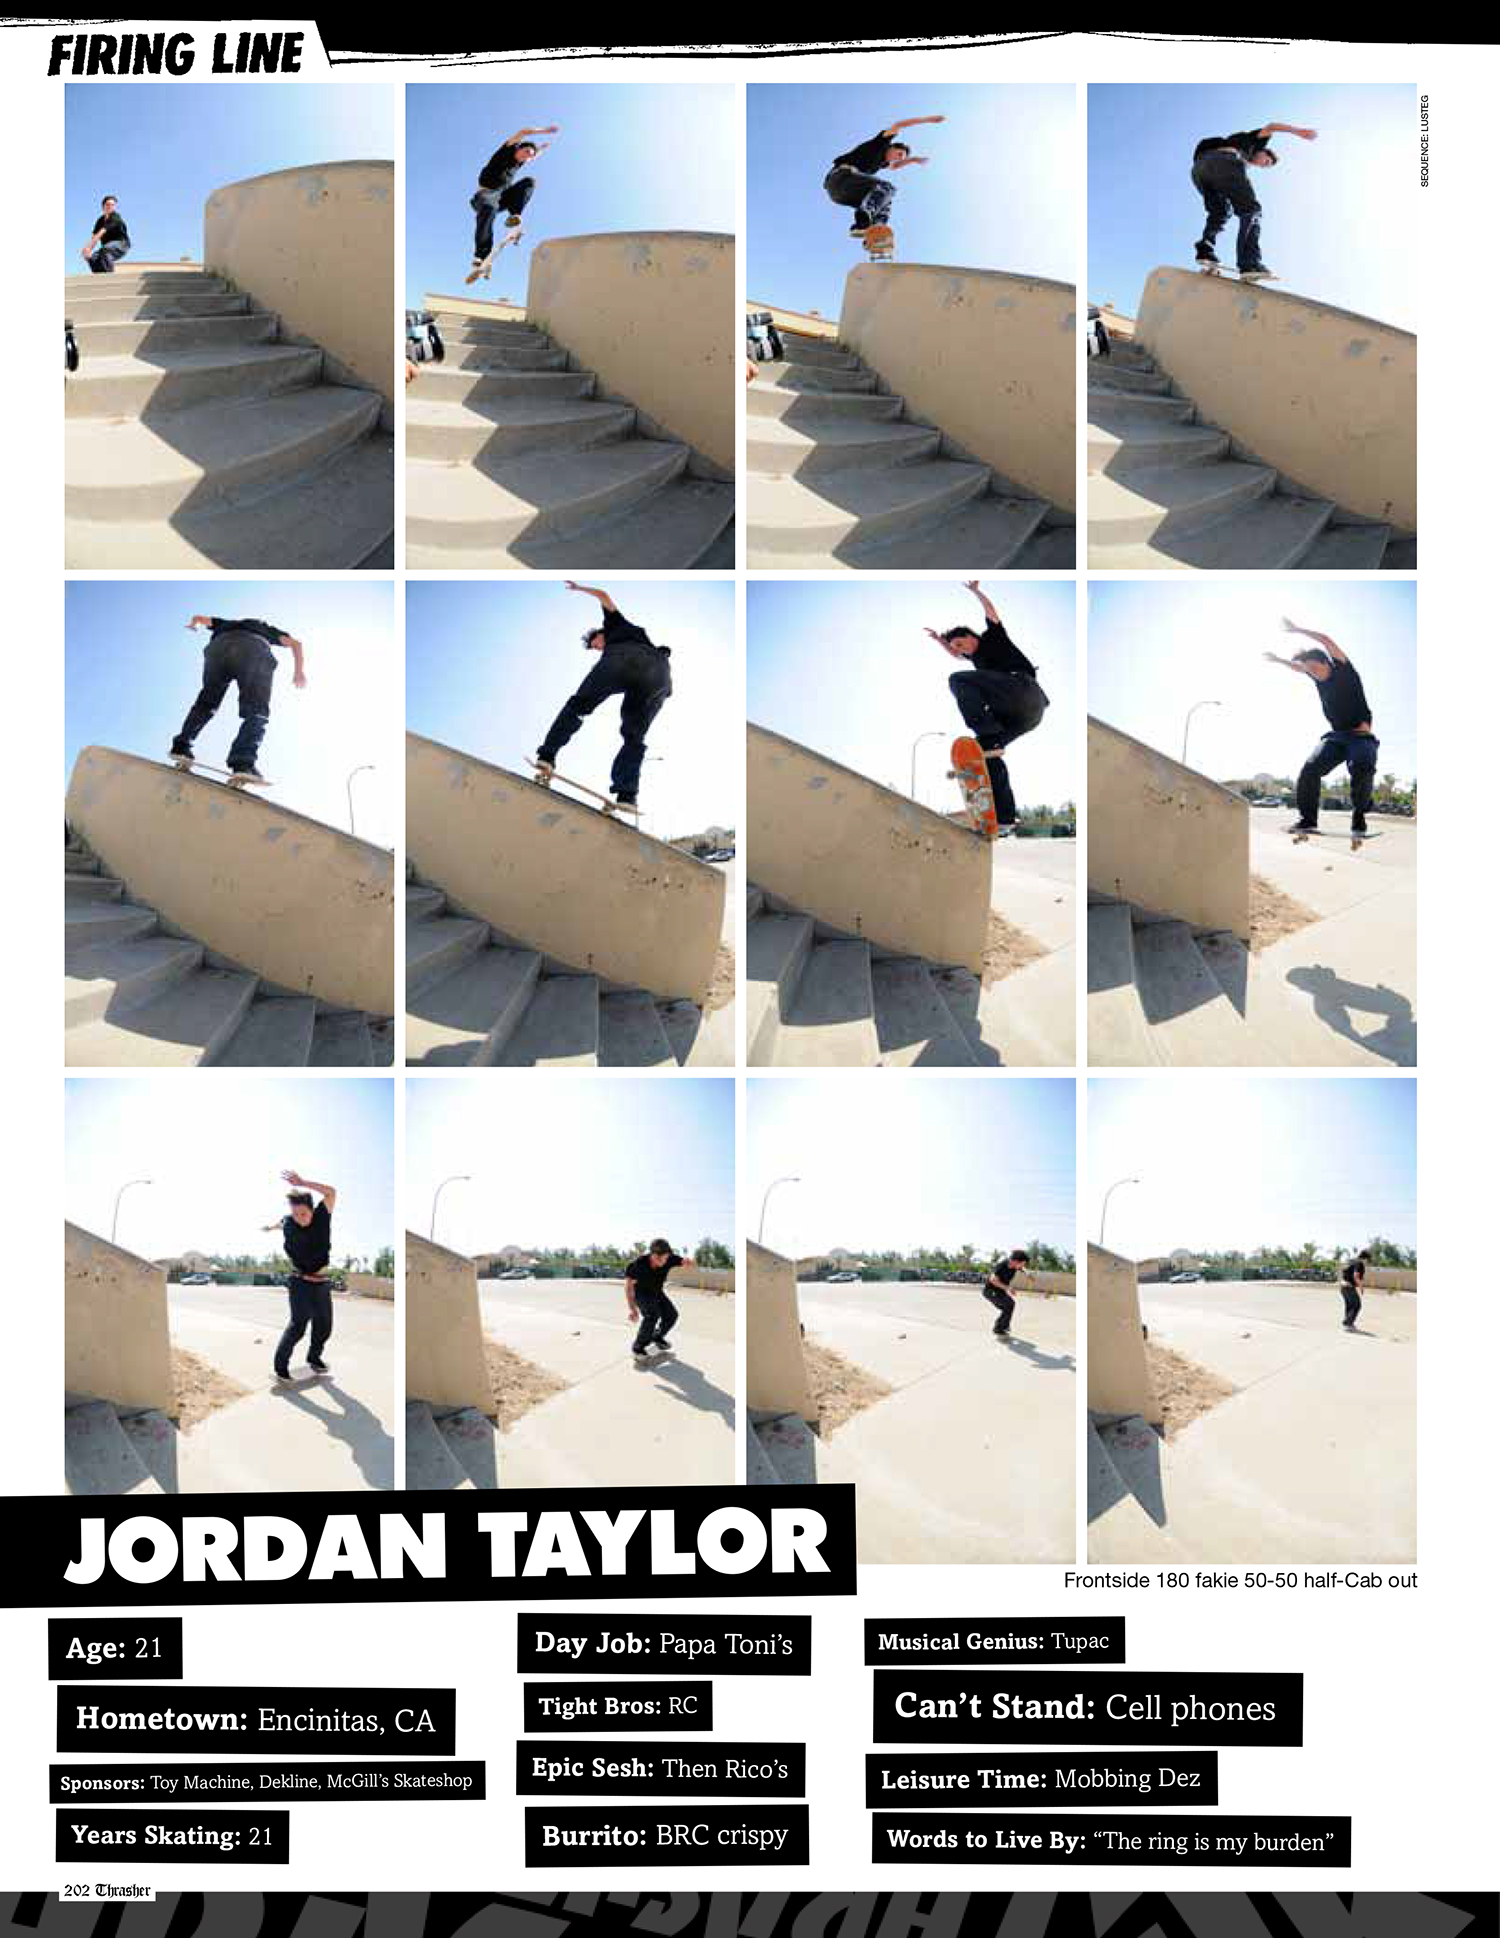 54_jordan_taylor_firing_line_thrasher.jpg